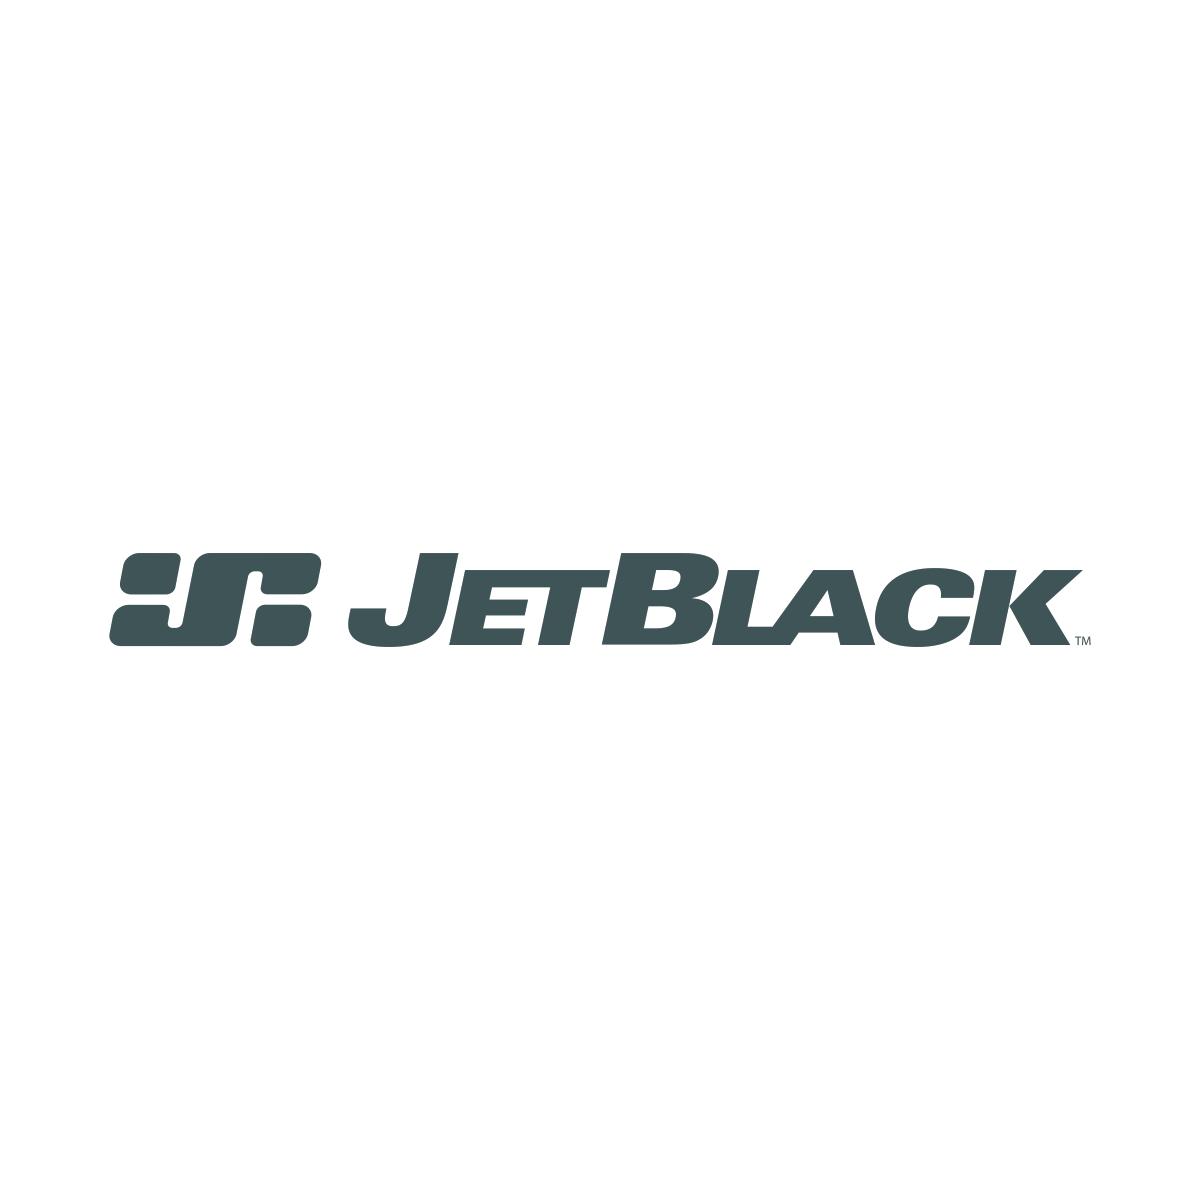 JetBlack